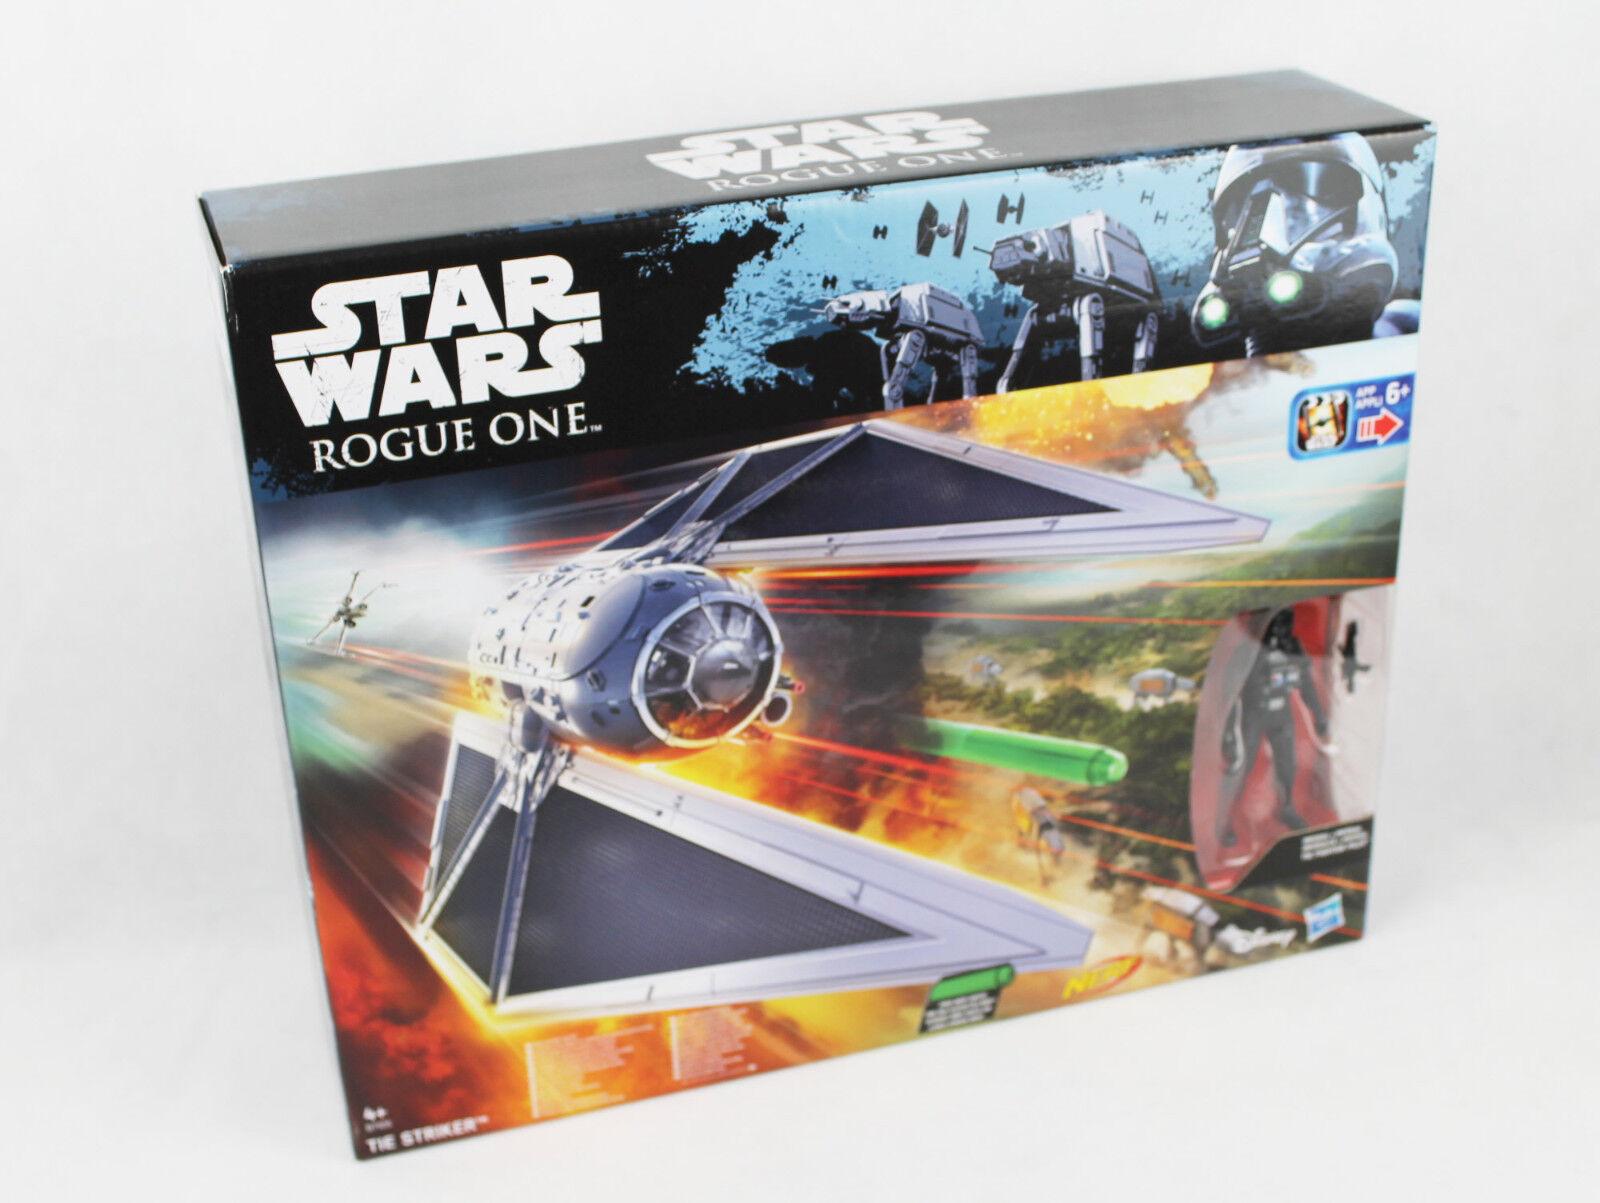 Star Wars Rogue One Fahrzeug - Tie-Striker mit 3.75 Figur (B7105)